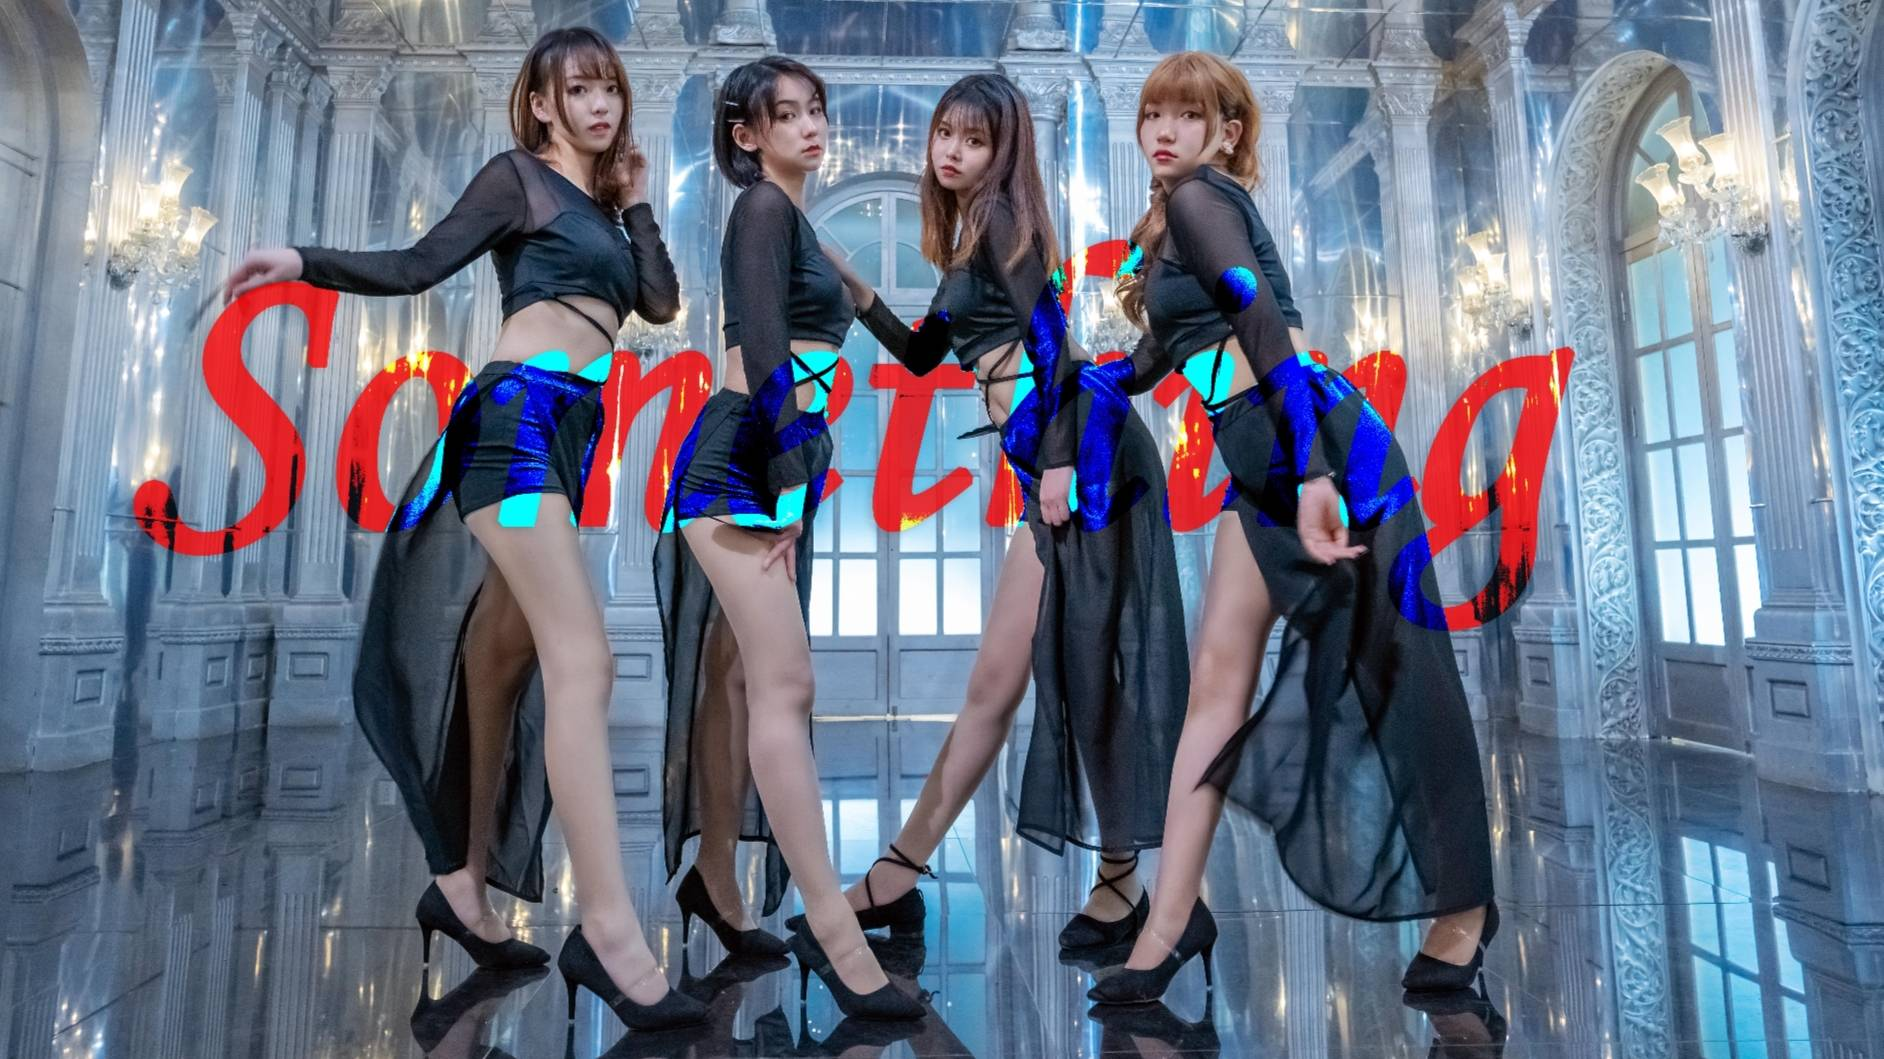 Something-Girl's Day 【性感神曲 文艺复兴】-你,不可以对我有秘密哦♡